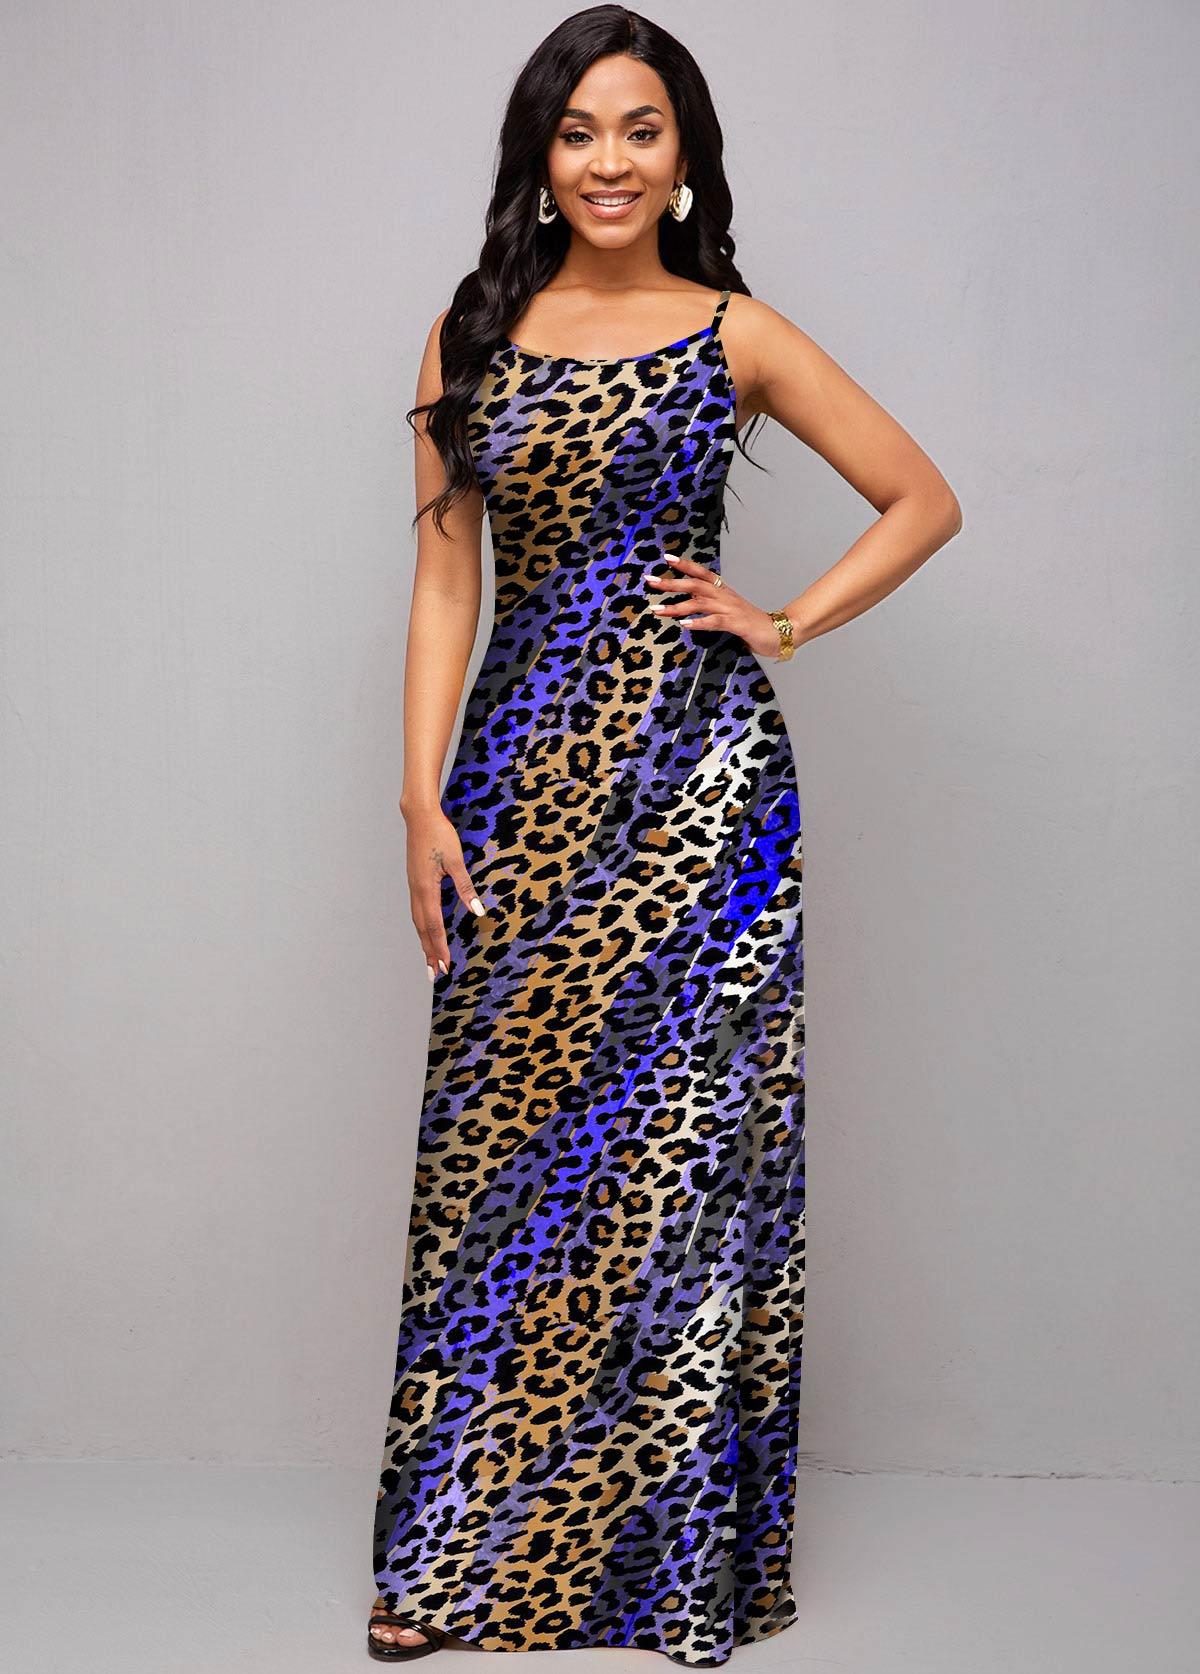 ROTITA Ombre Spaghetti Strap Animal Prints Dress